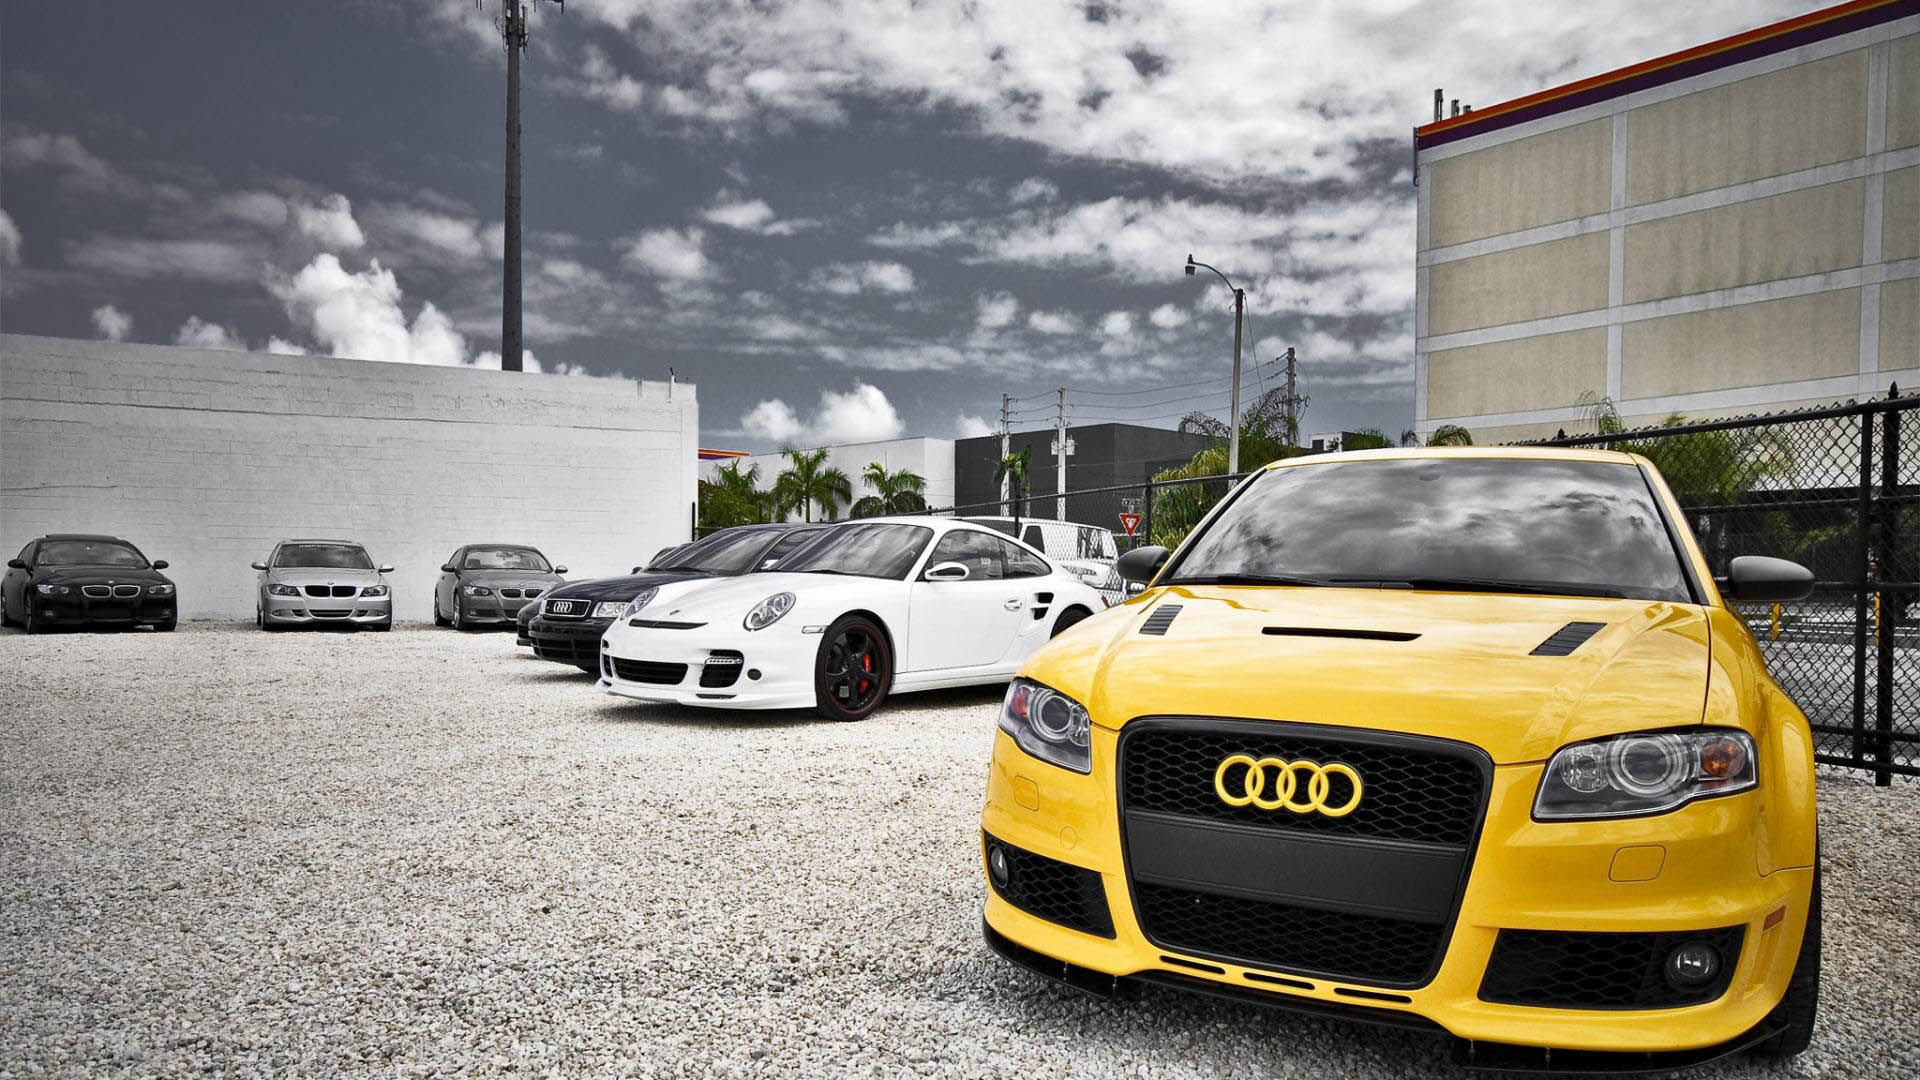 Simple Hd 1080p Car Wallpaper Yellow Audi Hd Wallpapers 1080p Collection Audi Audi Cars Audi Rs4